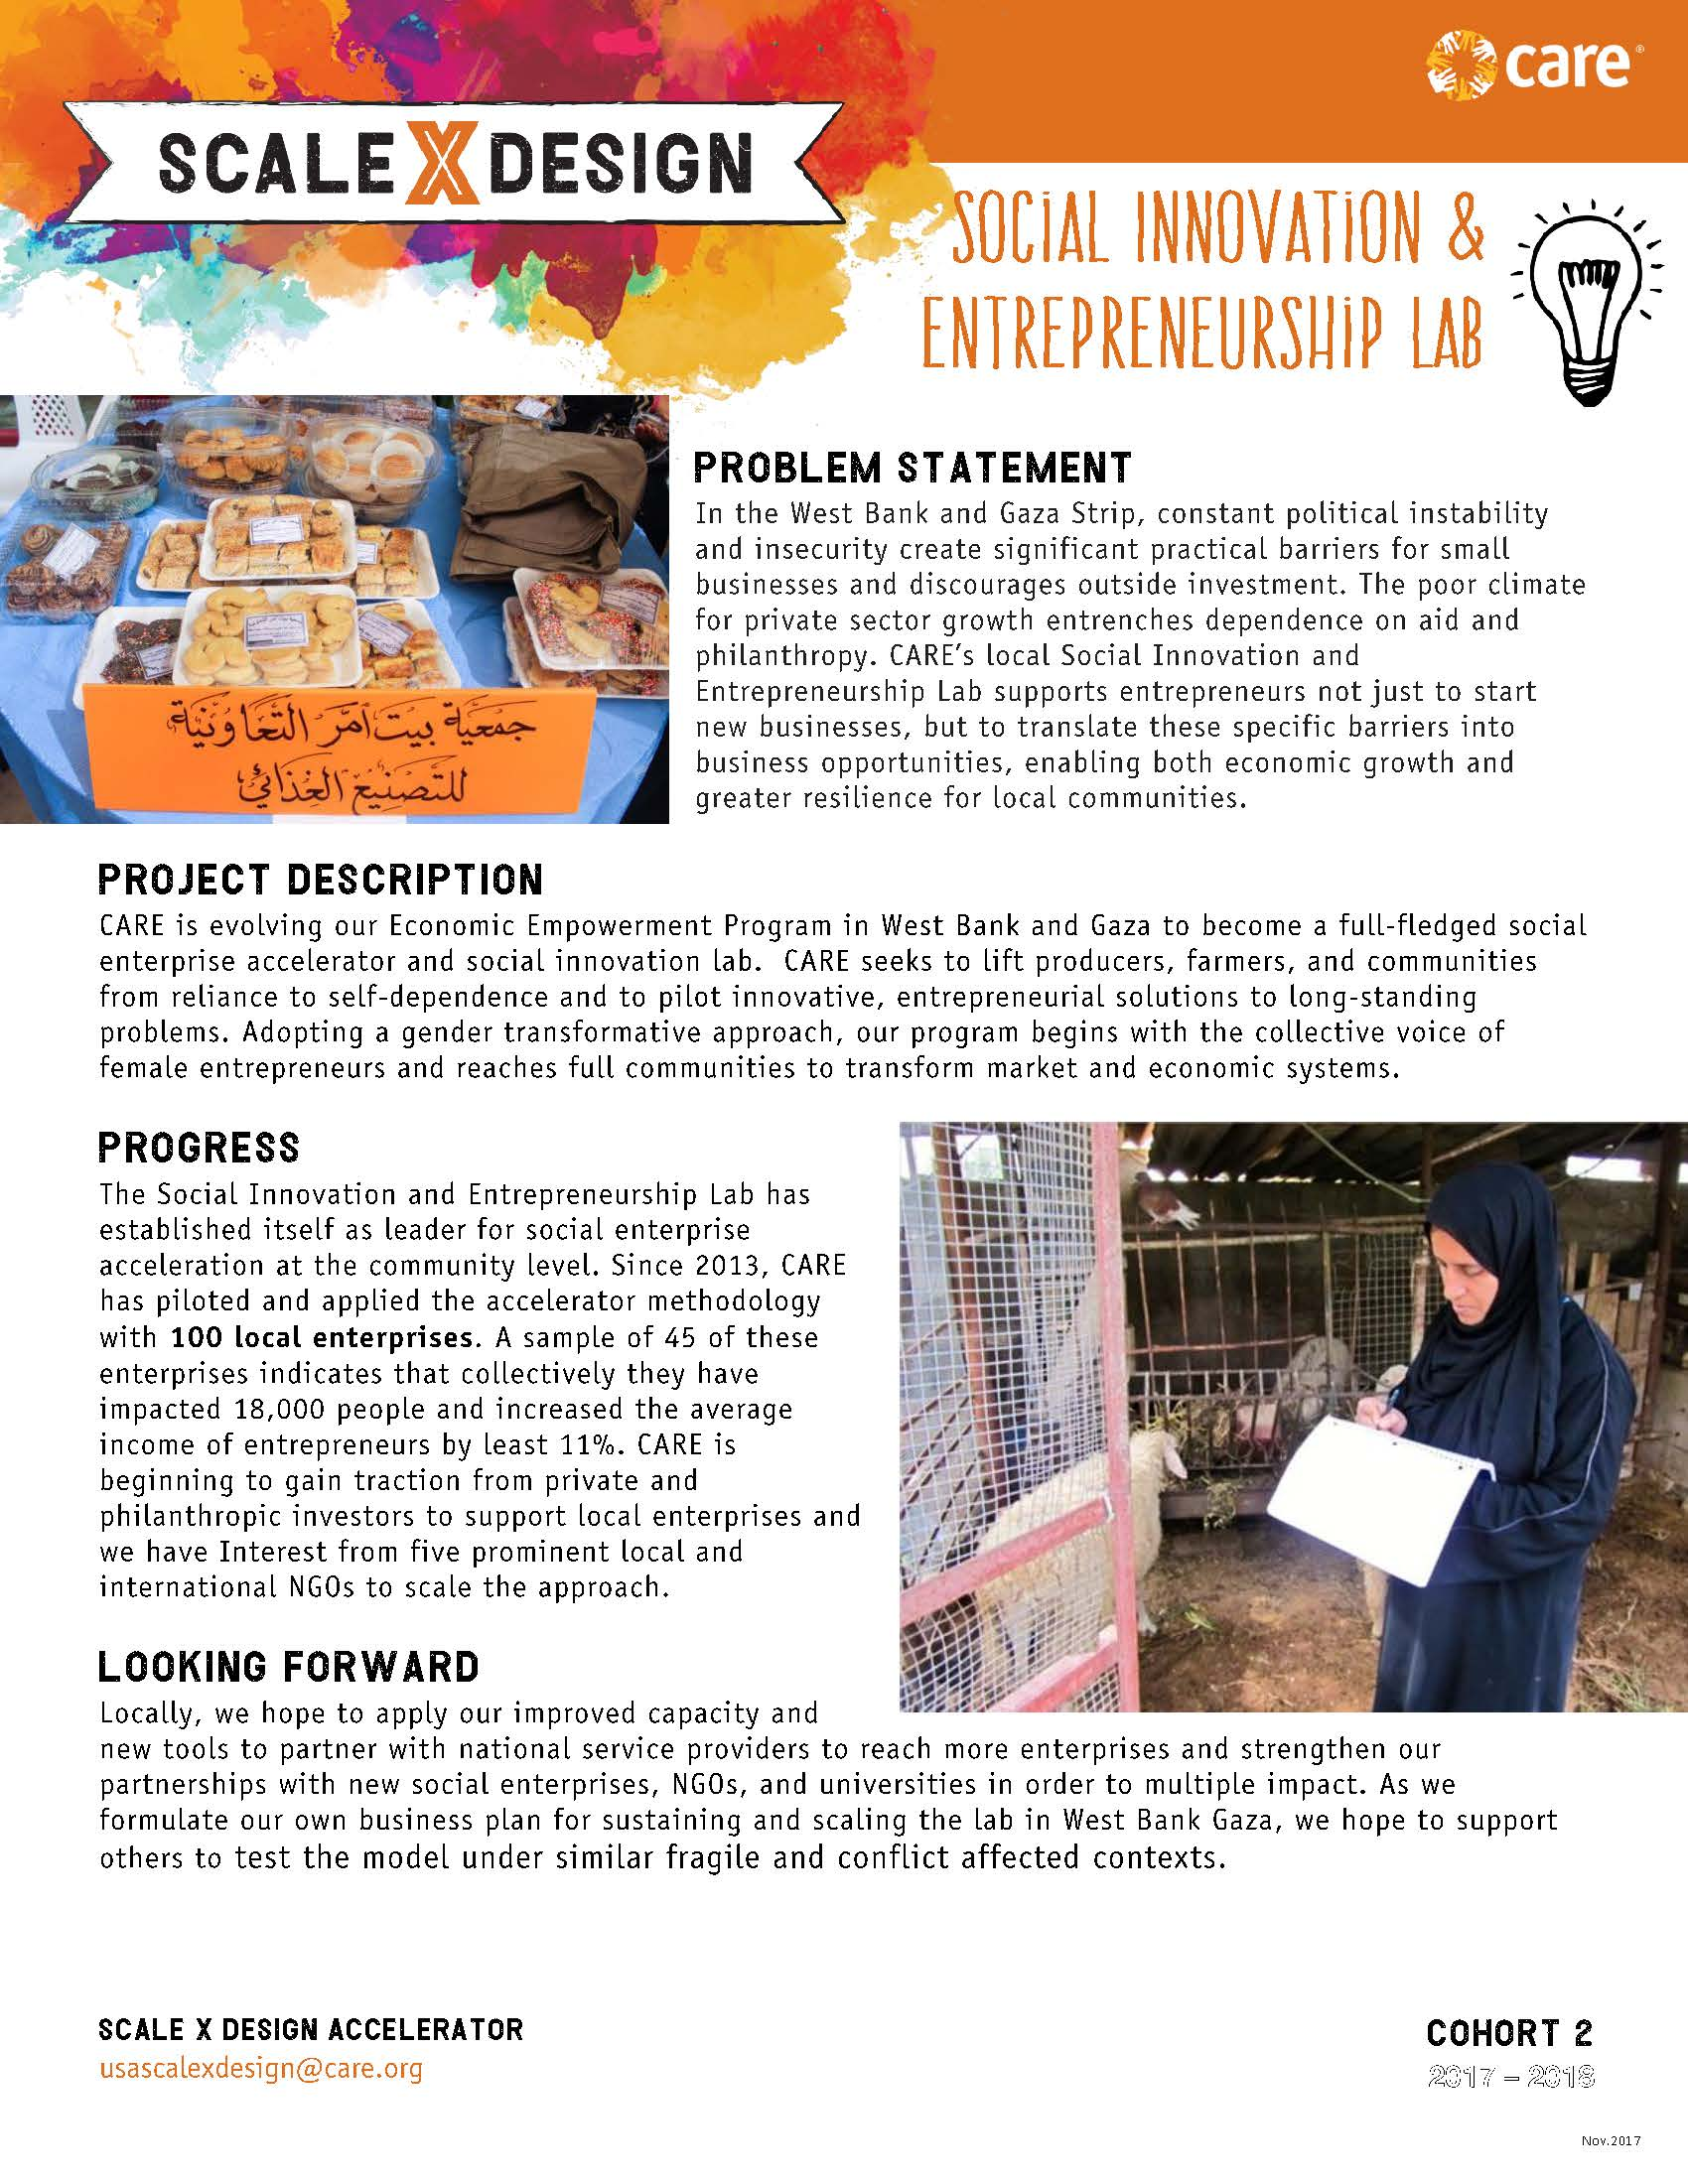 Uptakepreneur: A Social Entrepreneurship Lab